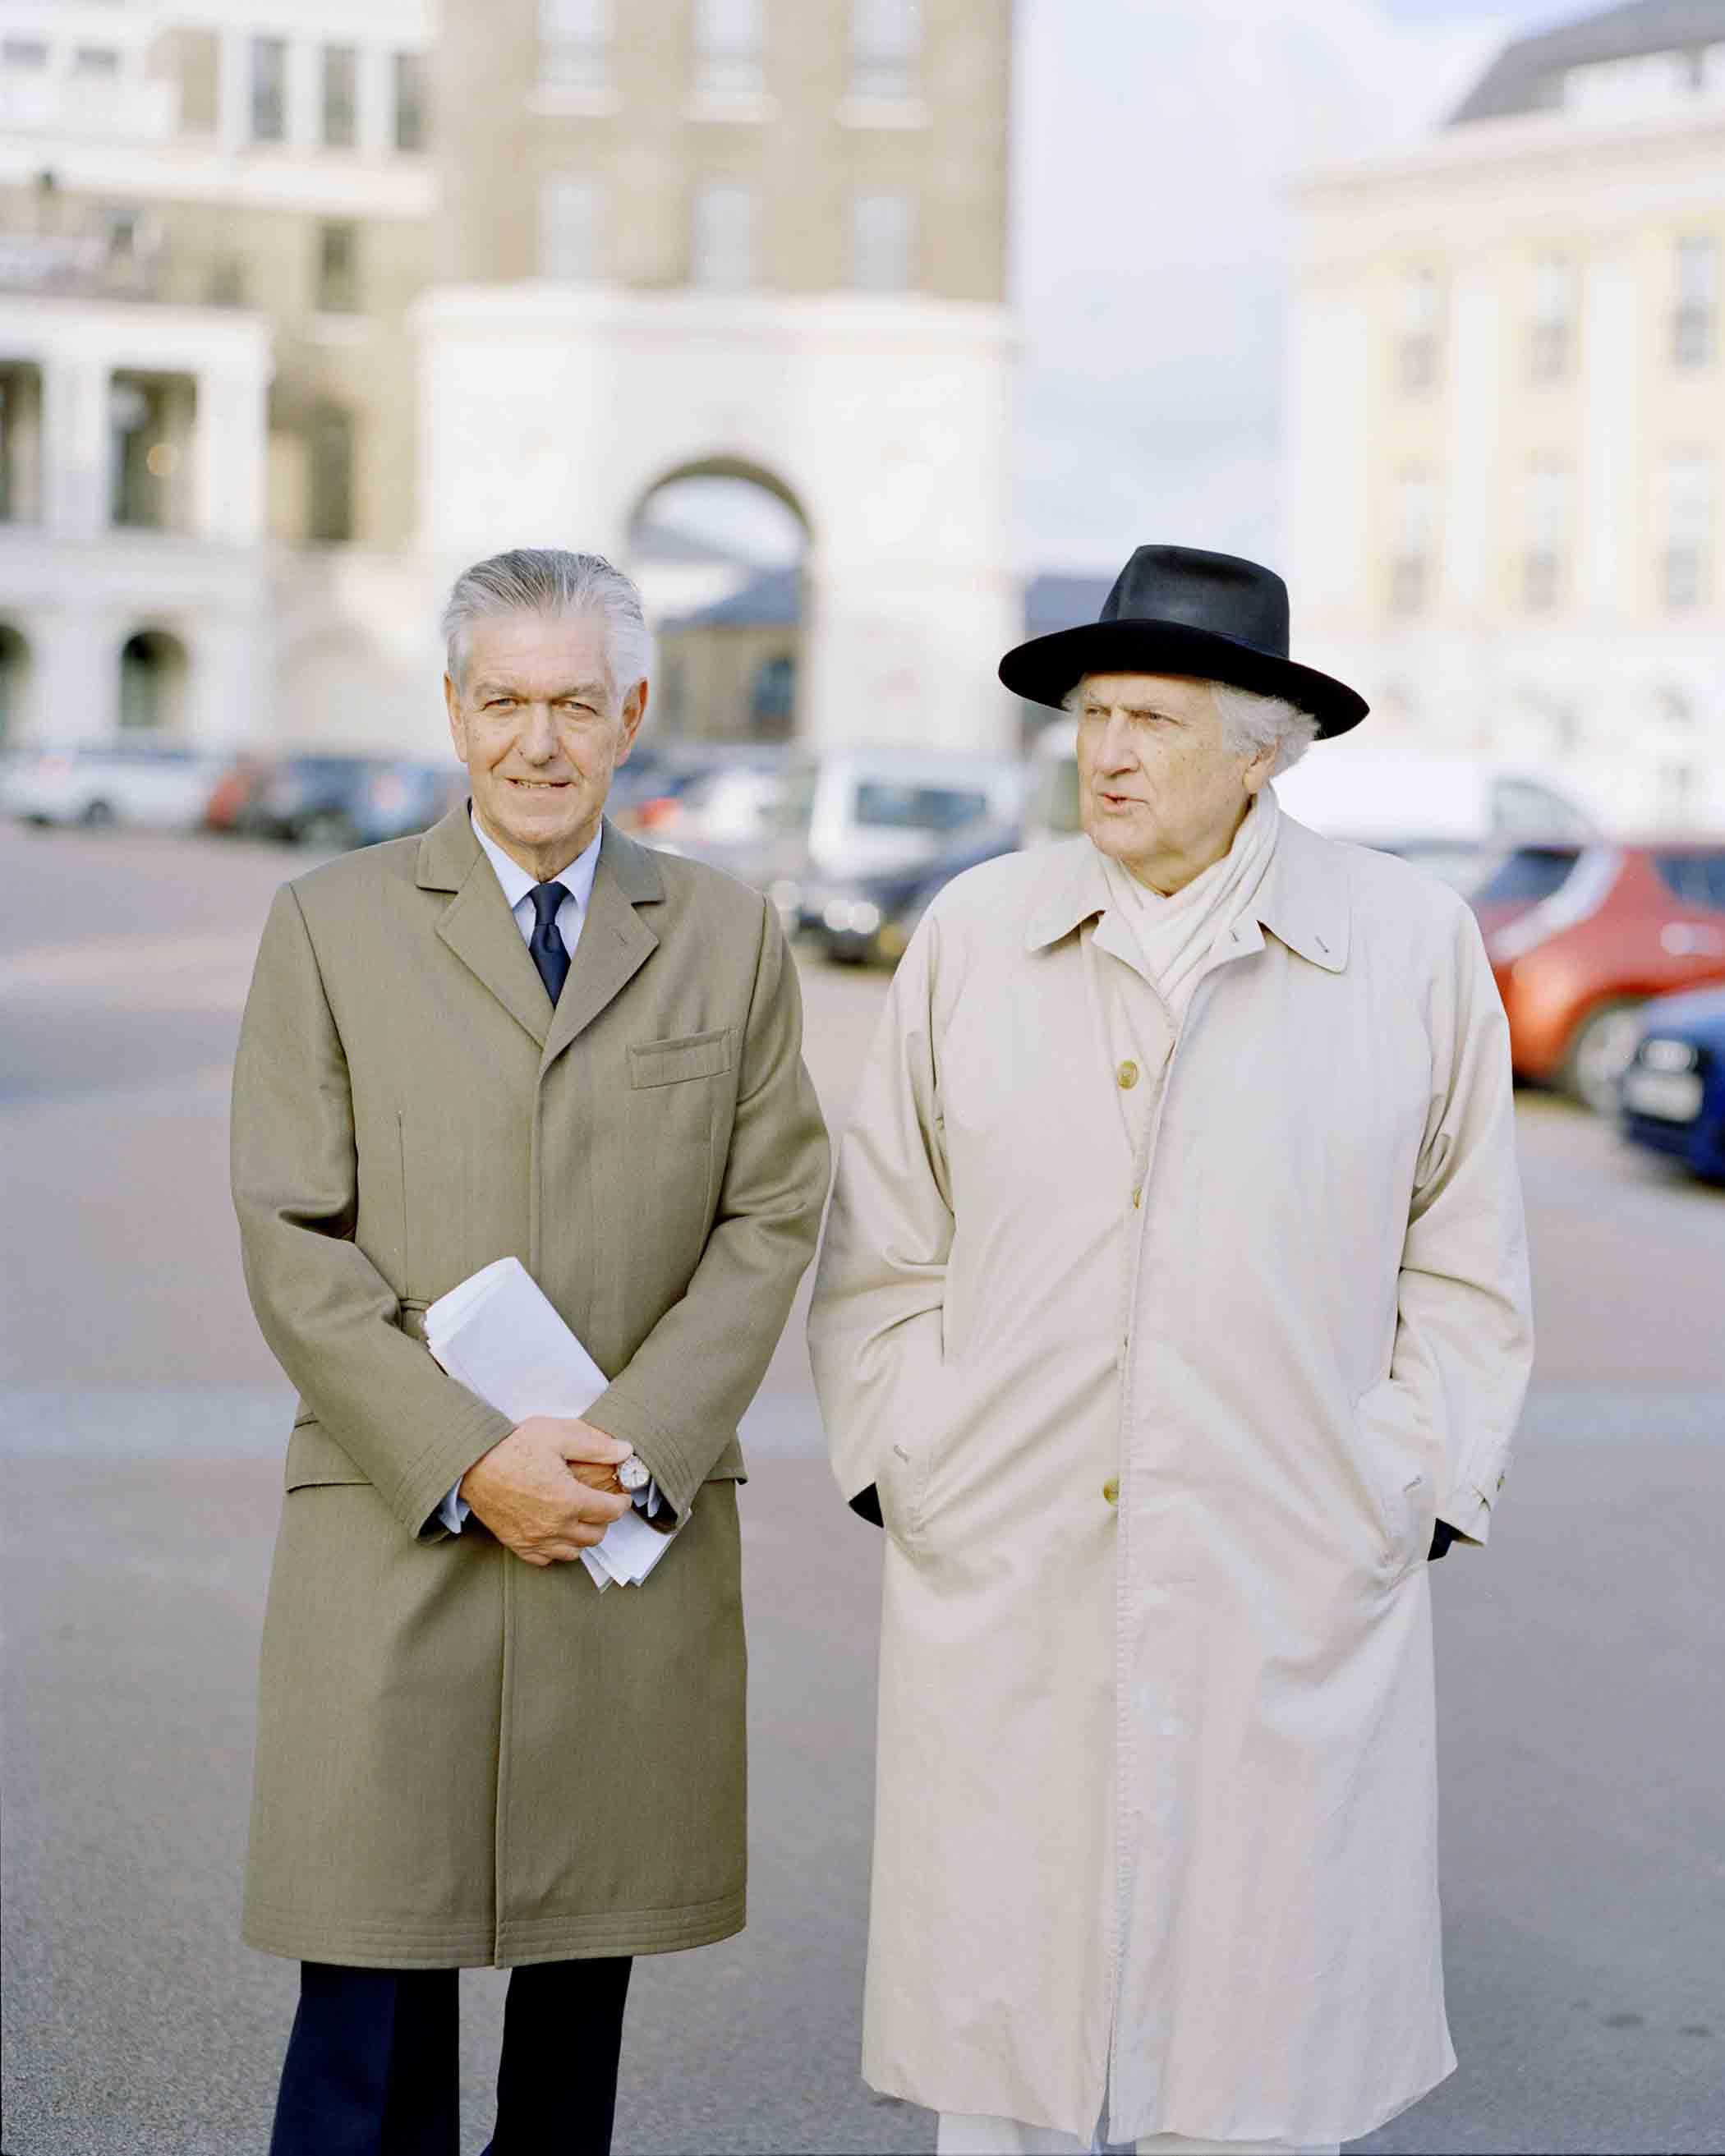 Leon Krier and Andrew Hamilton, for Building Britain.